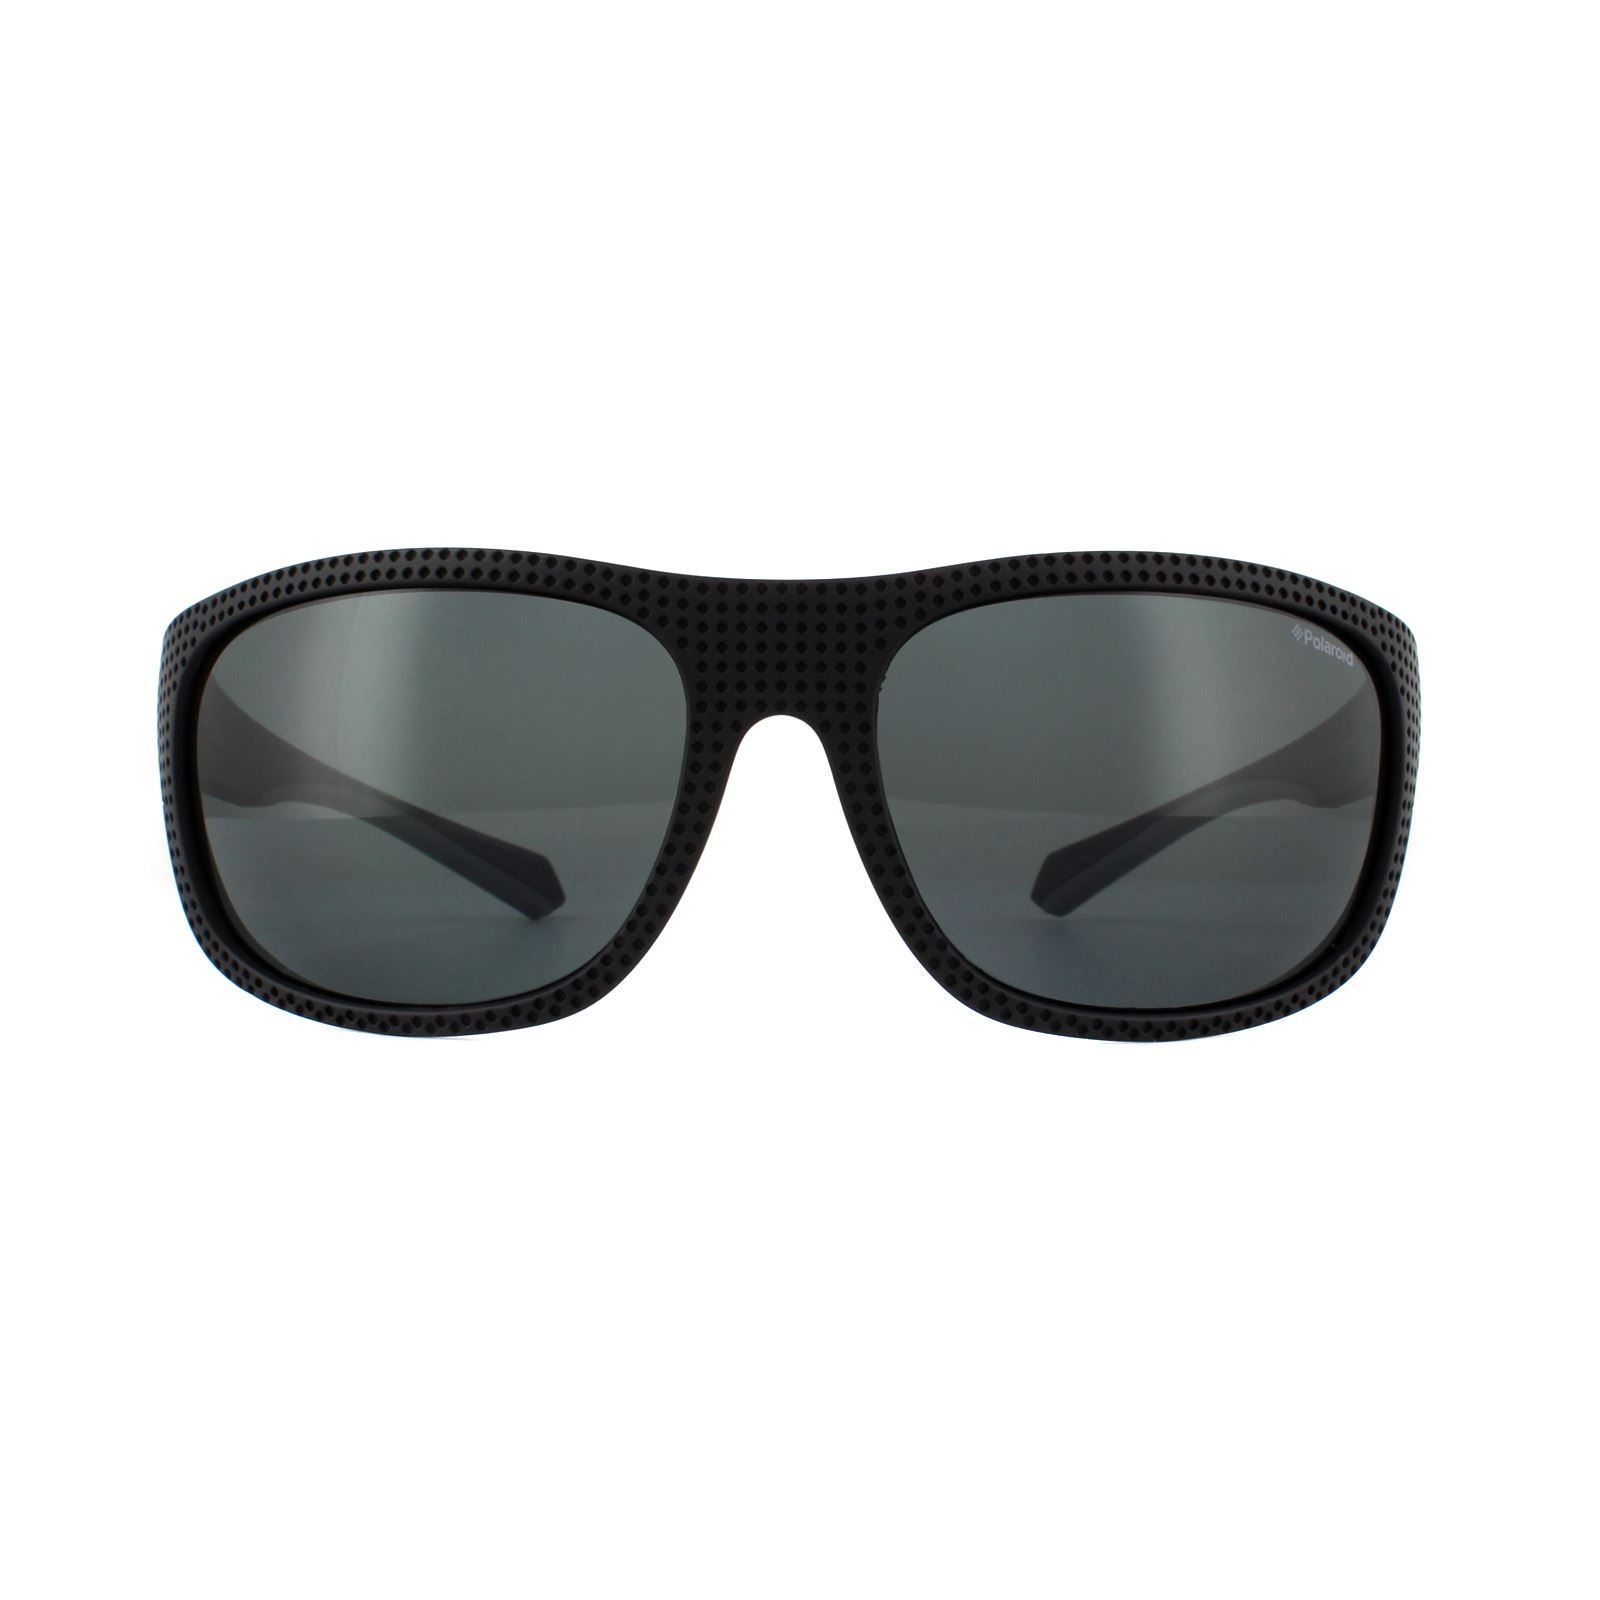 Polaroid Sport Sunglasses PLD 7022/S 807 M9 Black Grey Polarized